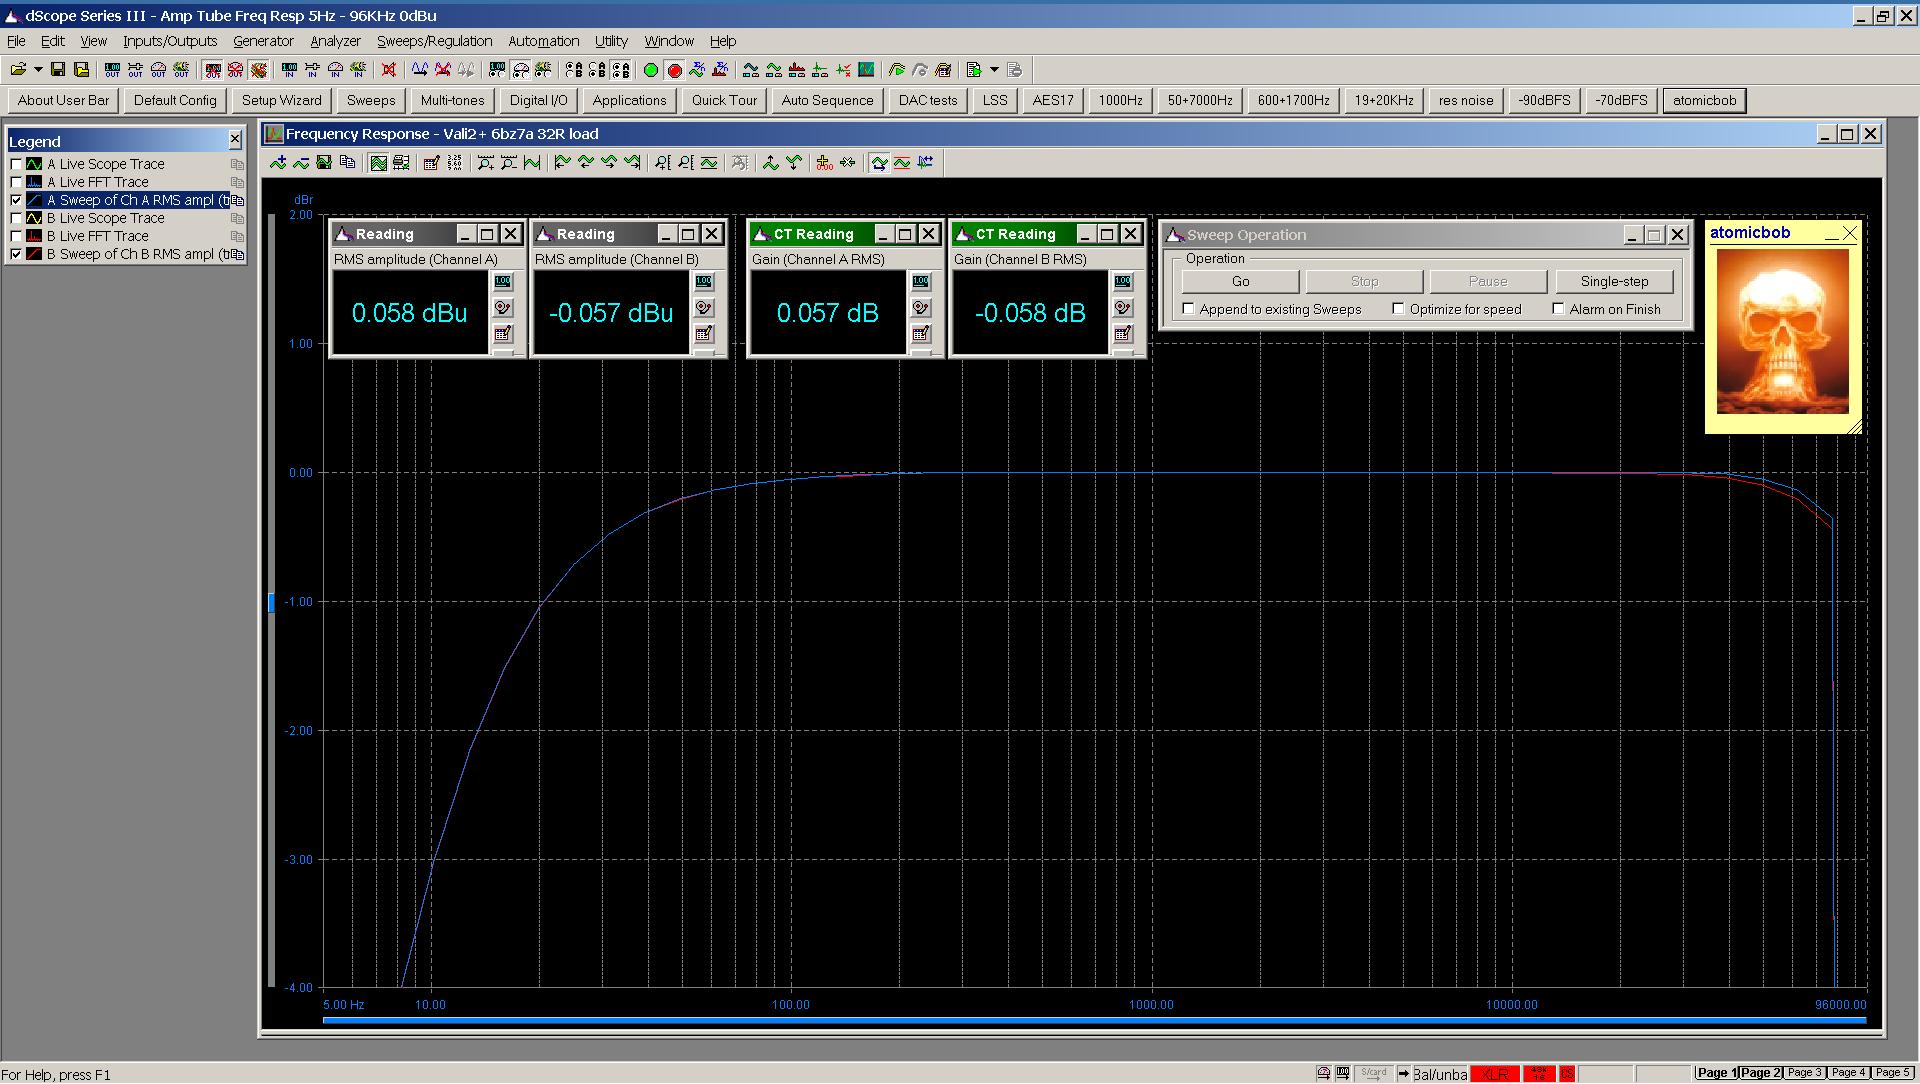 20201120 Vali2+ 6bz7a frequency response 5Hz - 96KHz 32R 0dBu.png